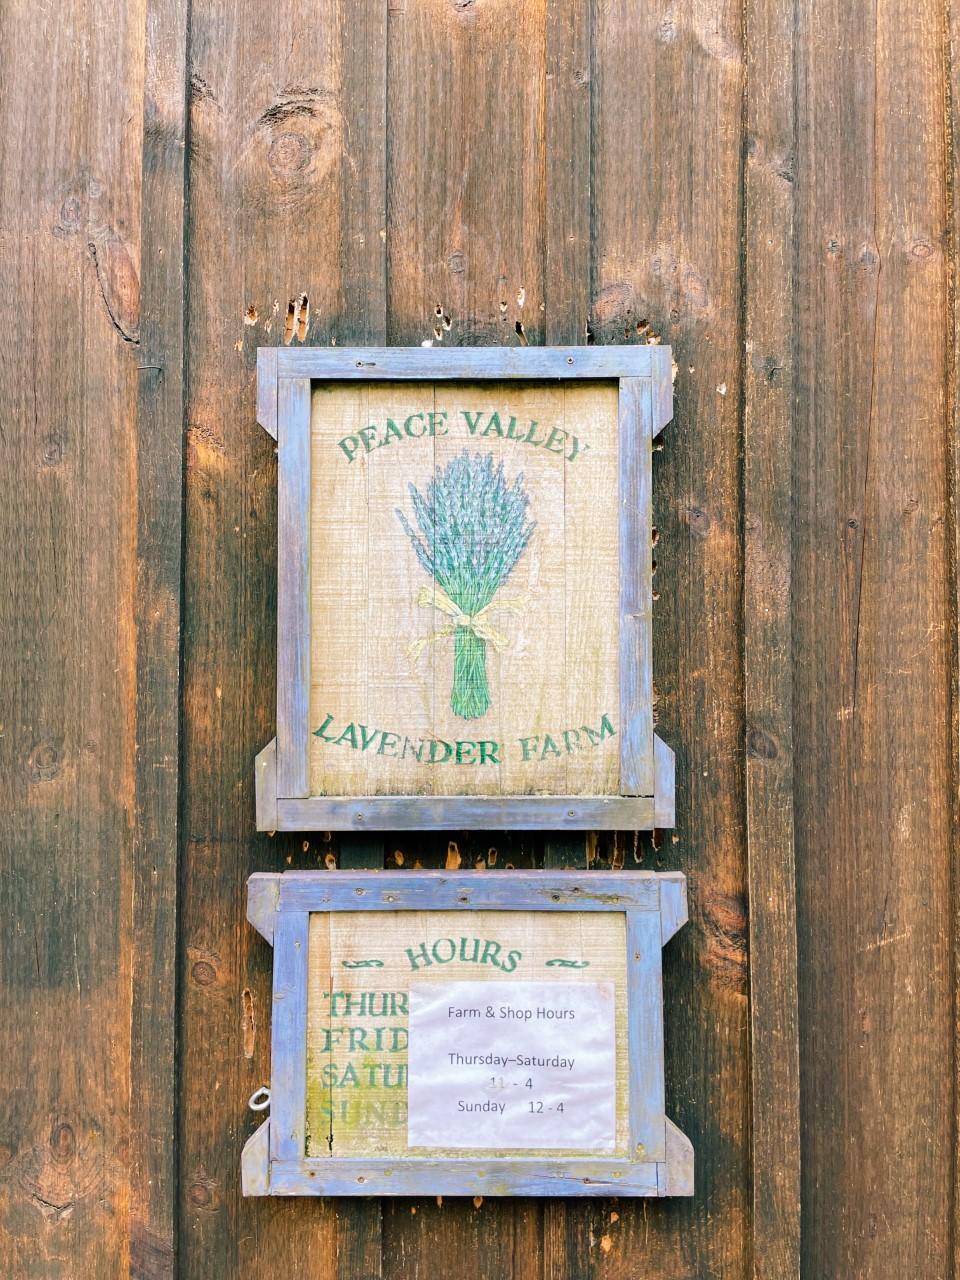 Peace Valley Lavender Farm in Doylestown, PA   Organized Mess